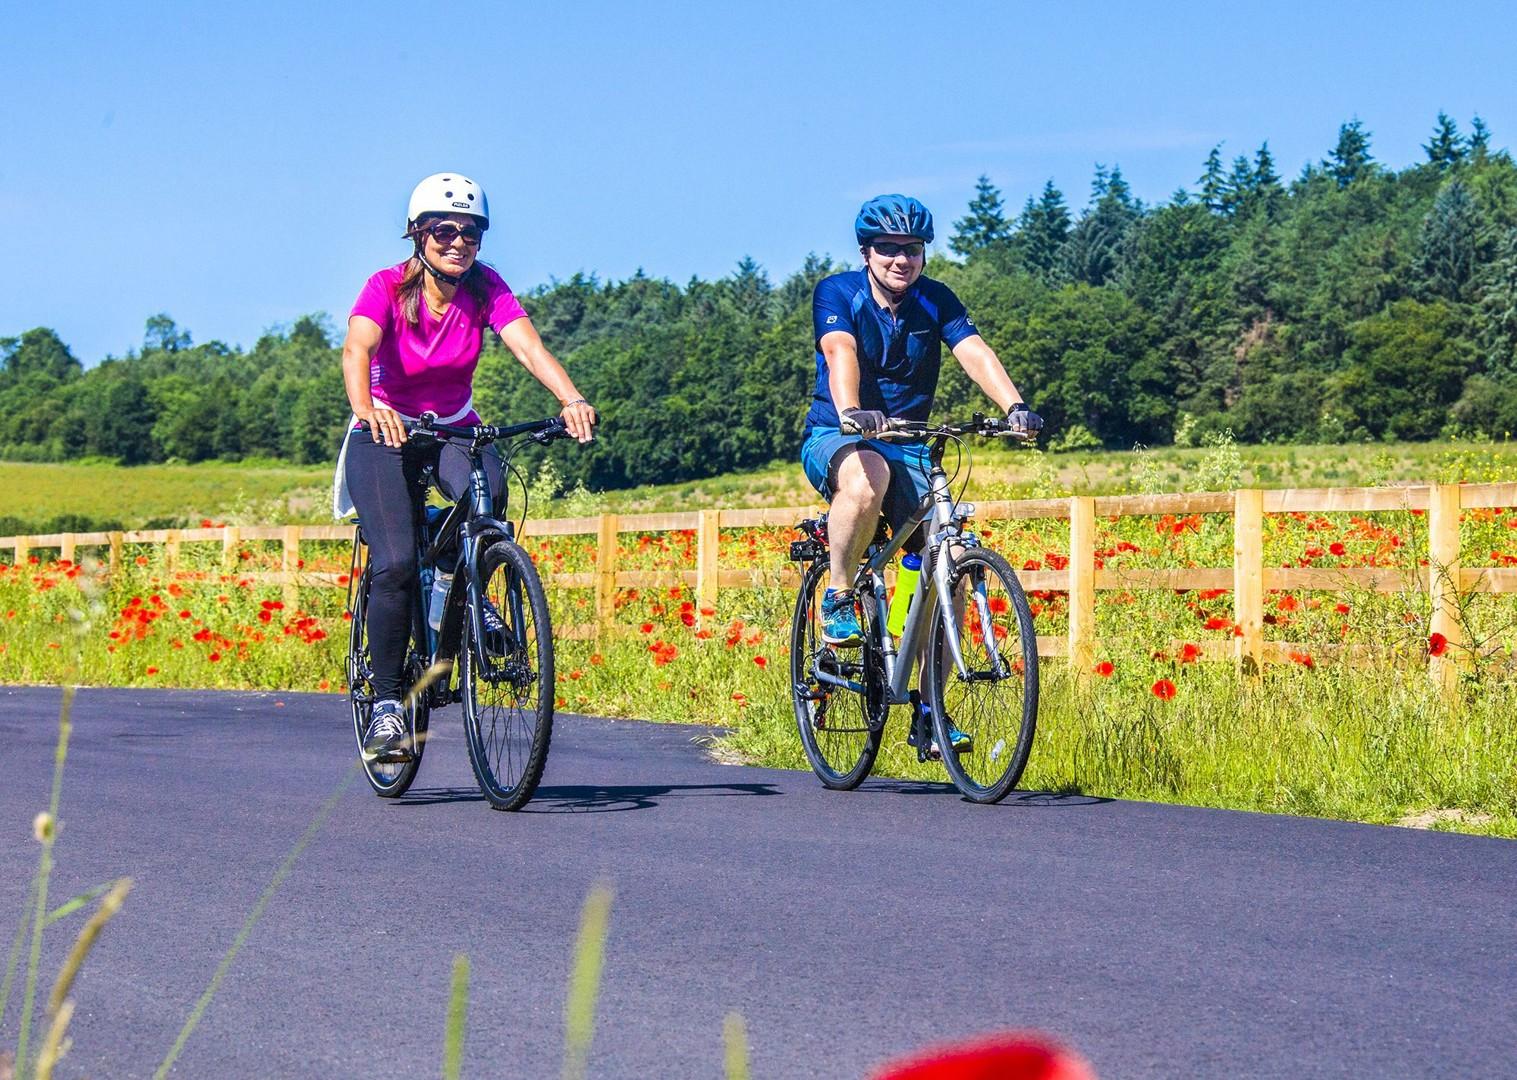 1906_0466-2.jpg - UK - Hadrian's Cycleway - 2 Days Cycling - Self-Guided Leisure Cycling Holiday - Leisure Cycling